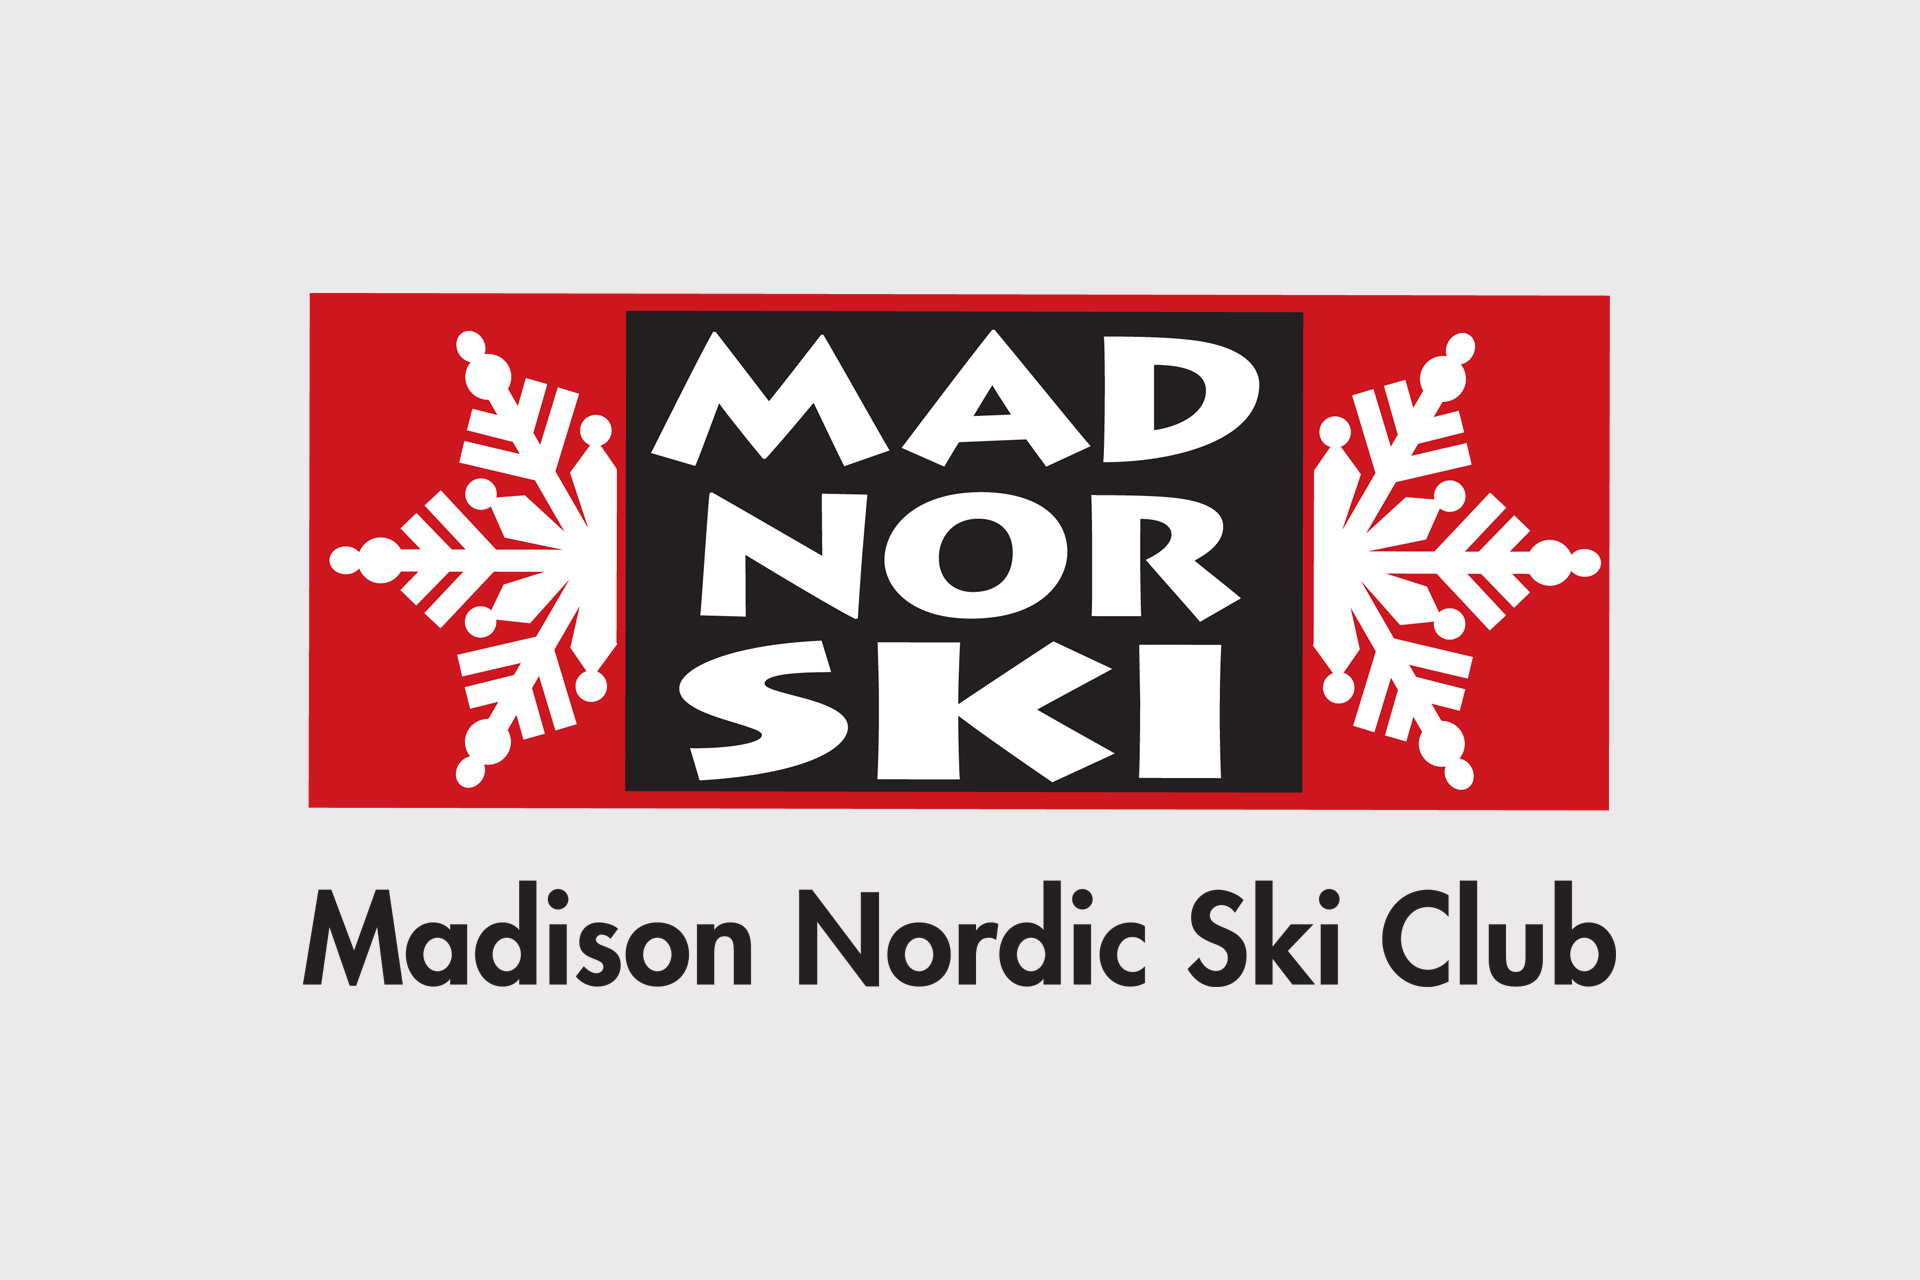 Madison Nordic Ski Club